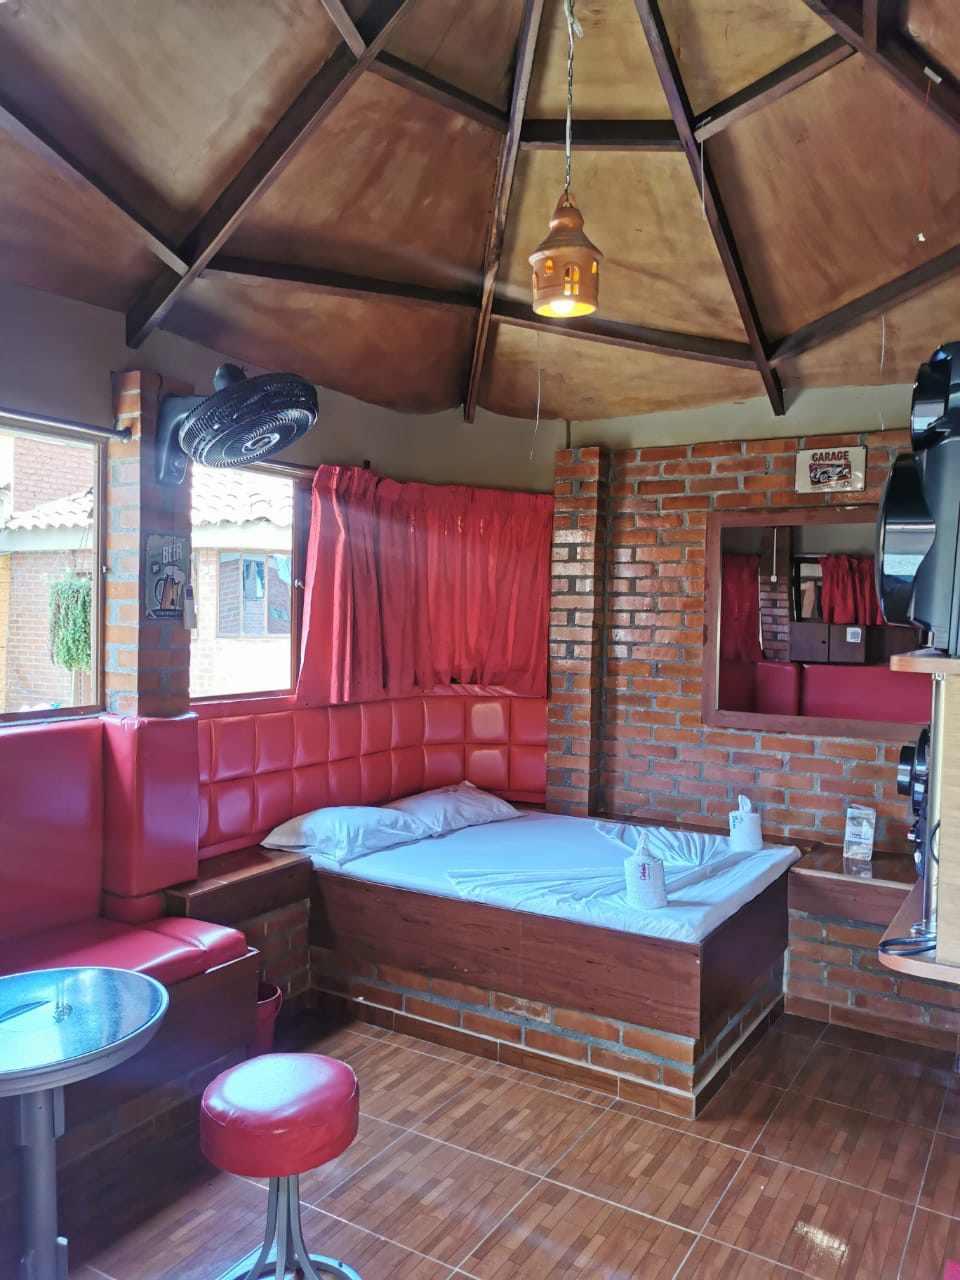 Caricias Juanchito en Juanchito : MotelNow